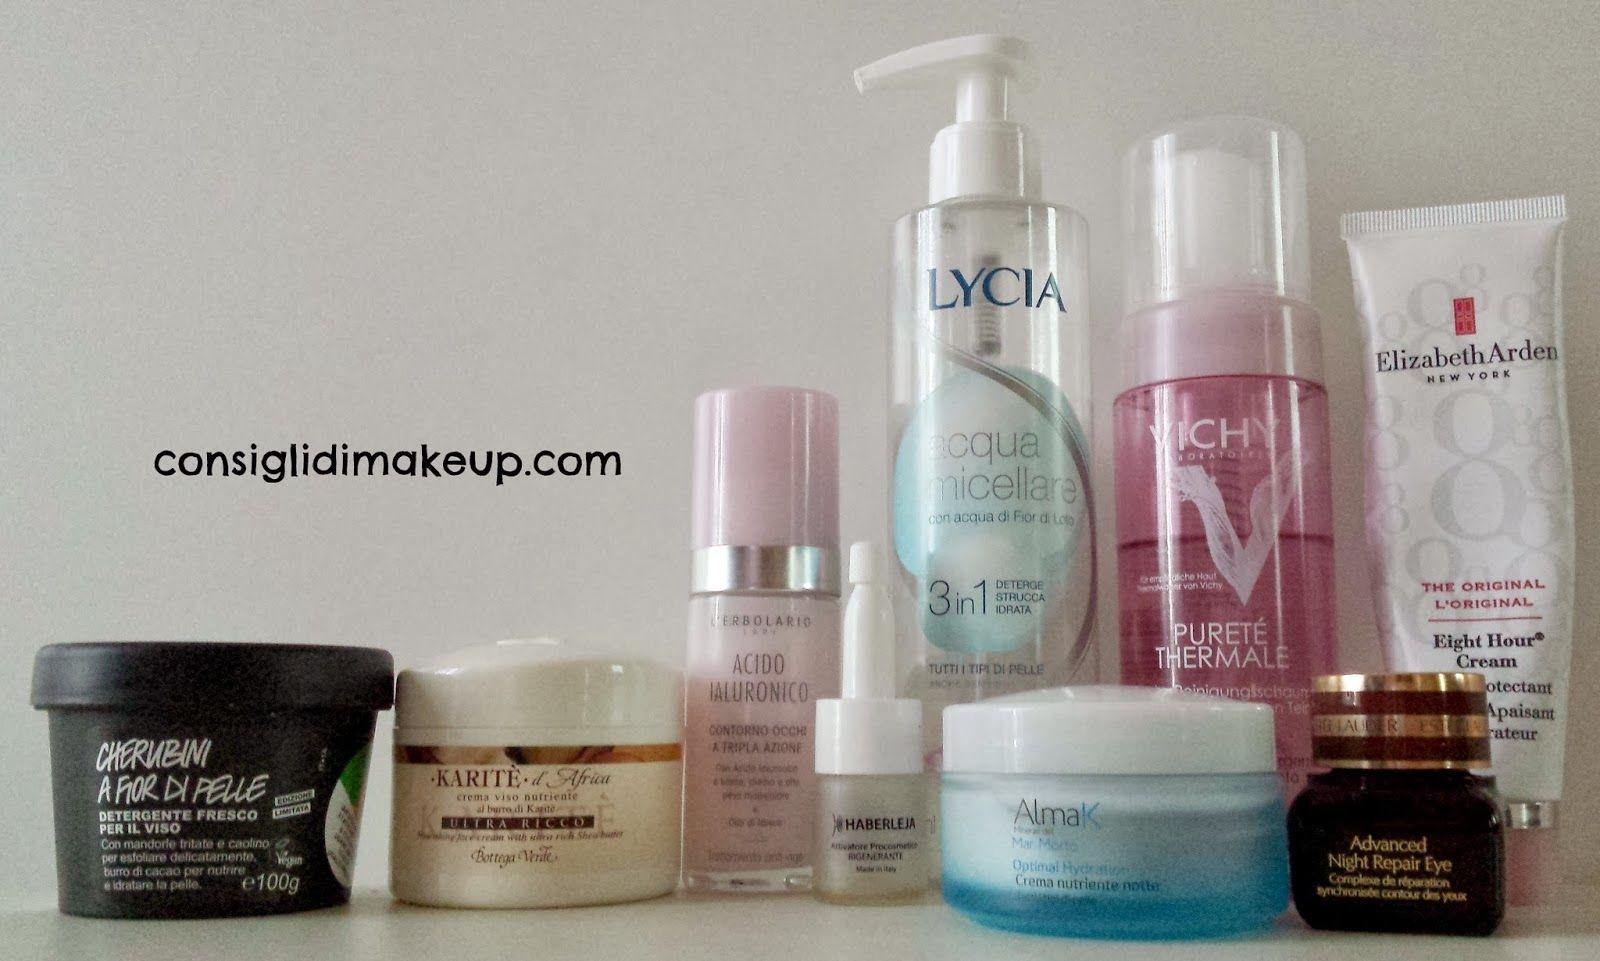 Skincare Routine - Consigli di Makeup I like this image - checkout more skincare stuff at www.roacutane.org